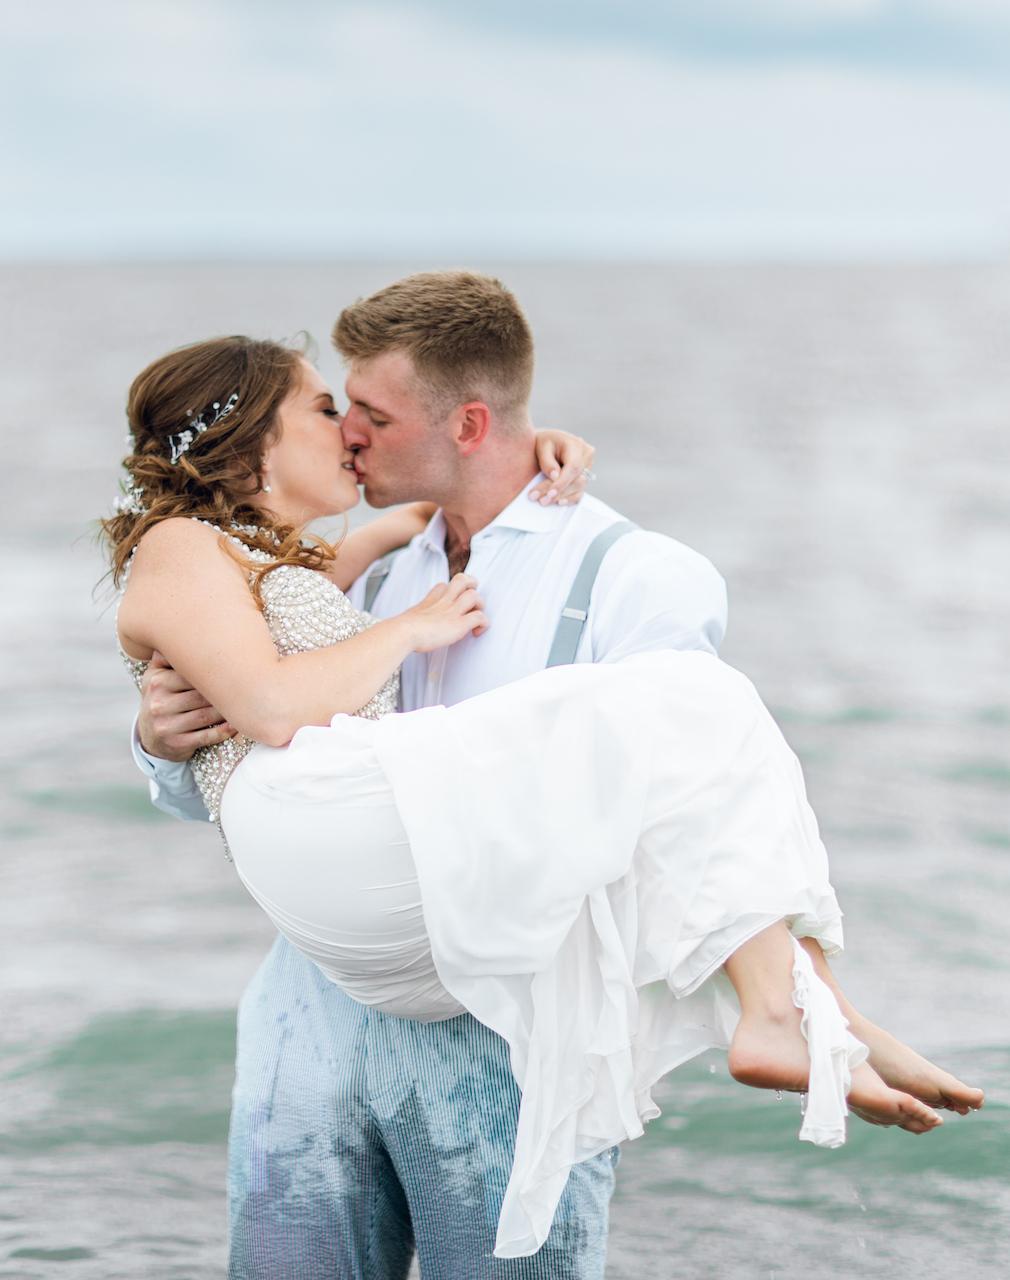 hilton-head-island-wedding-sc-portraits224.jpg